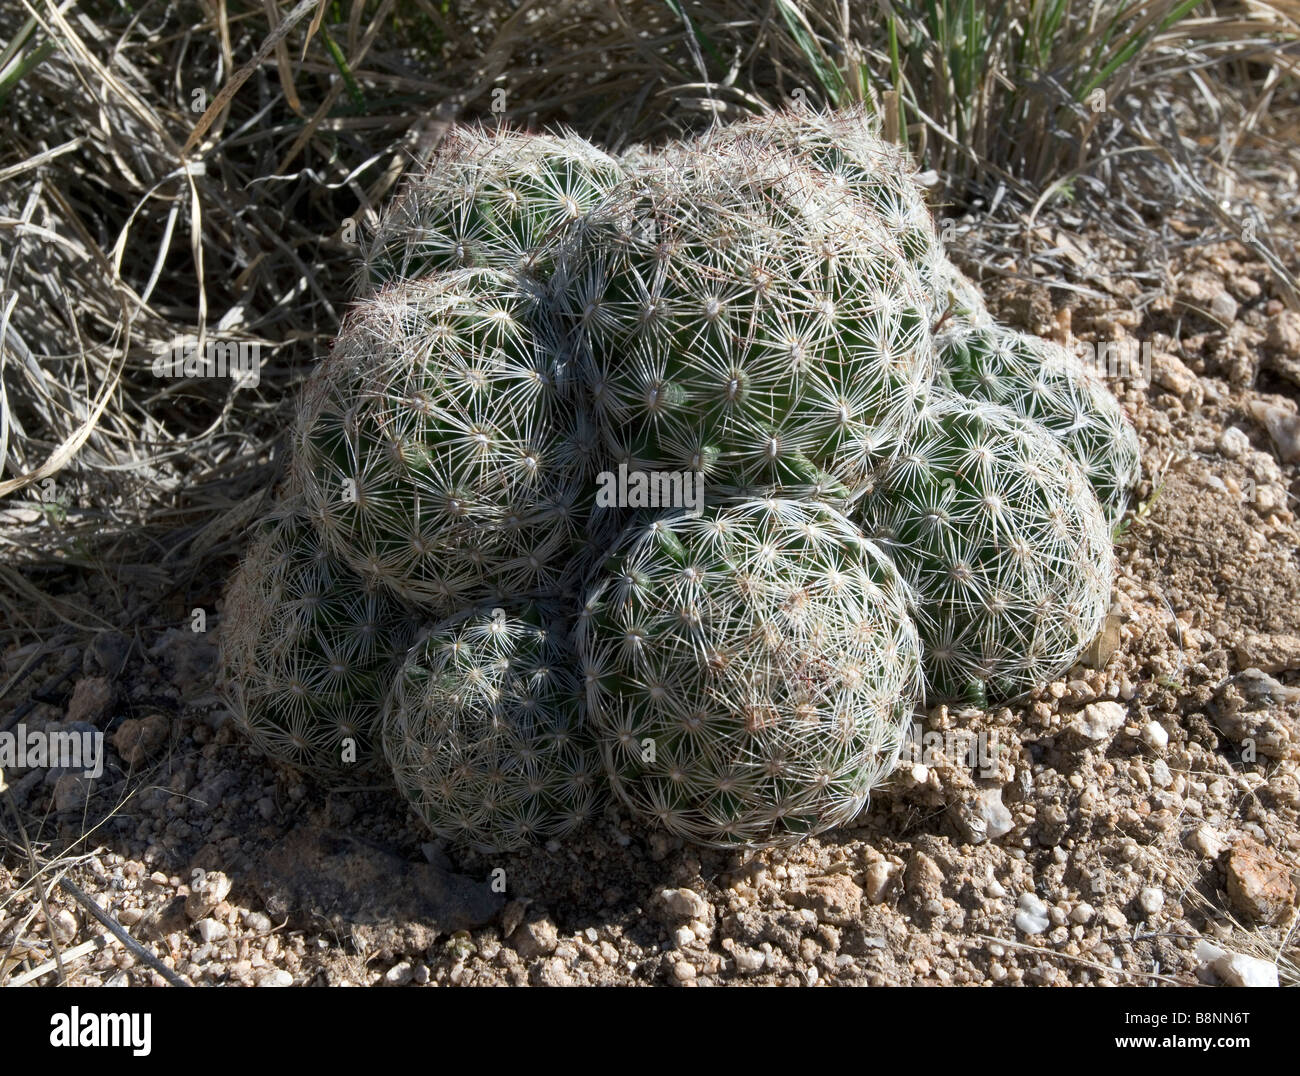 A Beehive or Spinystar cactus found in Southern Arizona near Tucson. Escobaria vivipara - Stock Image